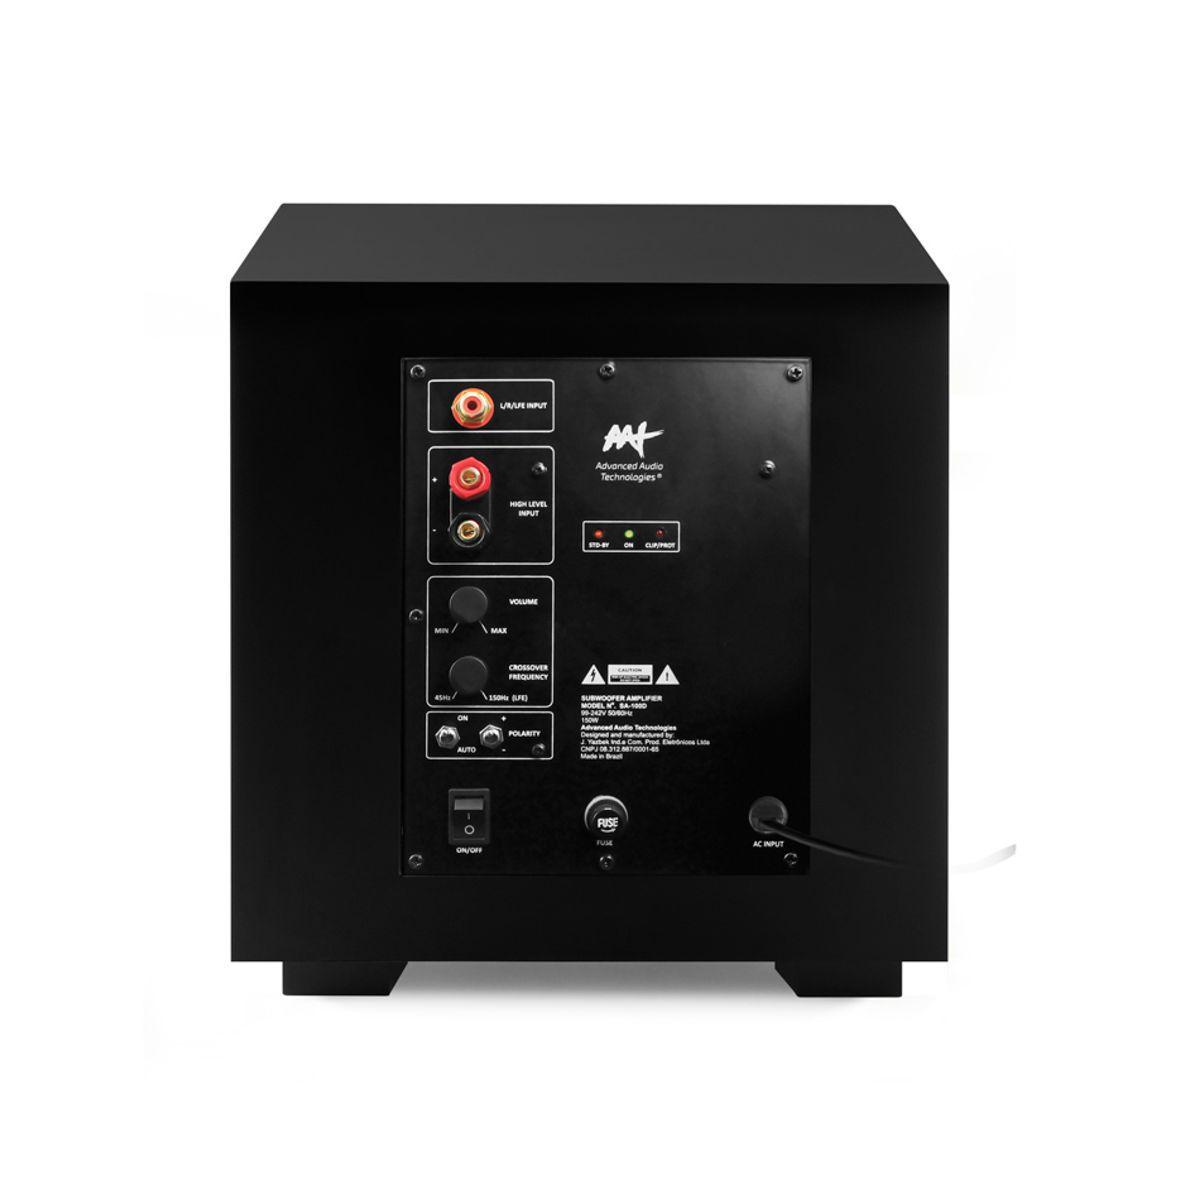 "Subwoofer Ativo Compact Cube 10"" 240W RMS de Potência Máxima AAT"